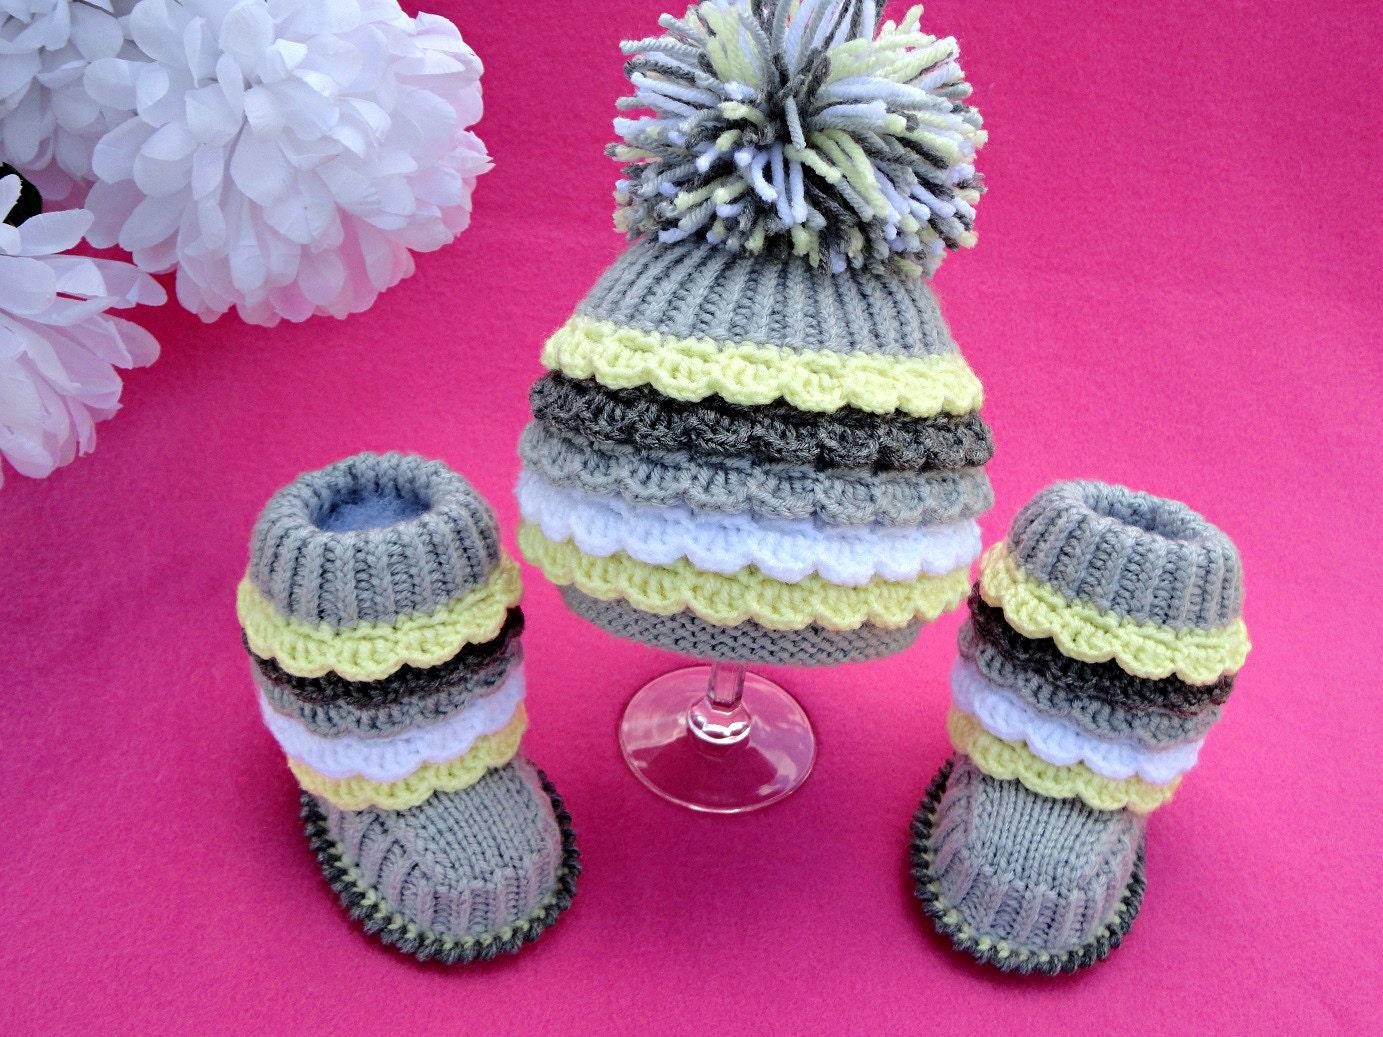 Crochet and knitting patterns PDF files by LittleOwlsHut